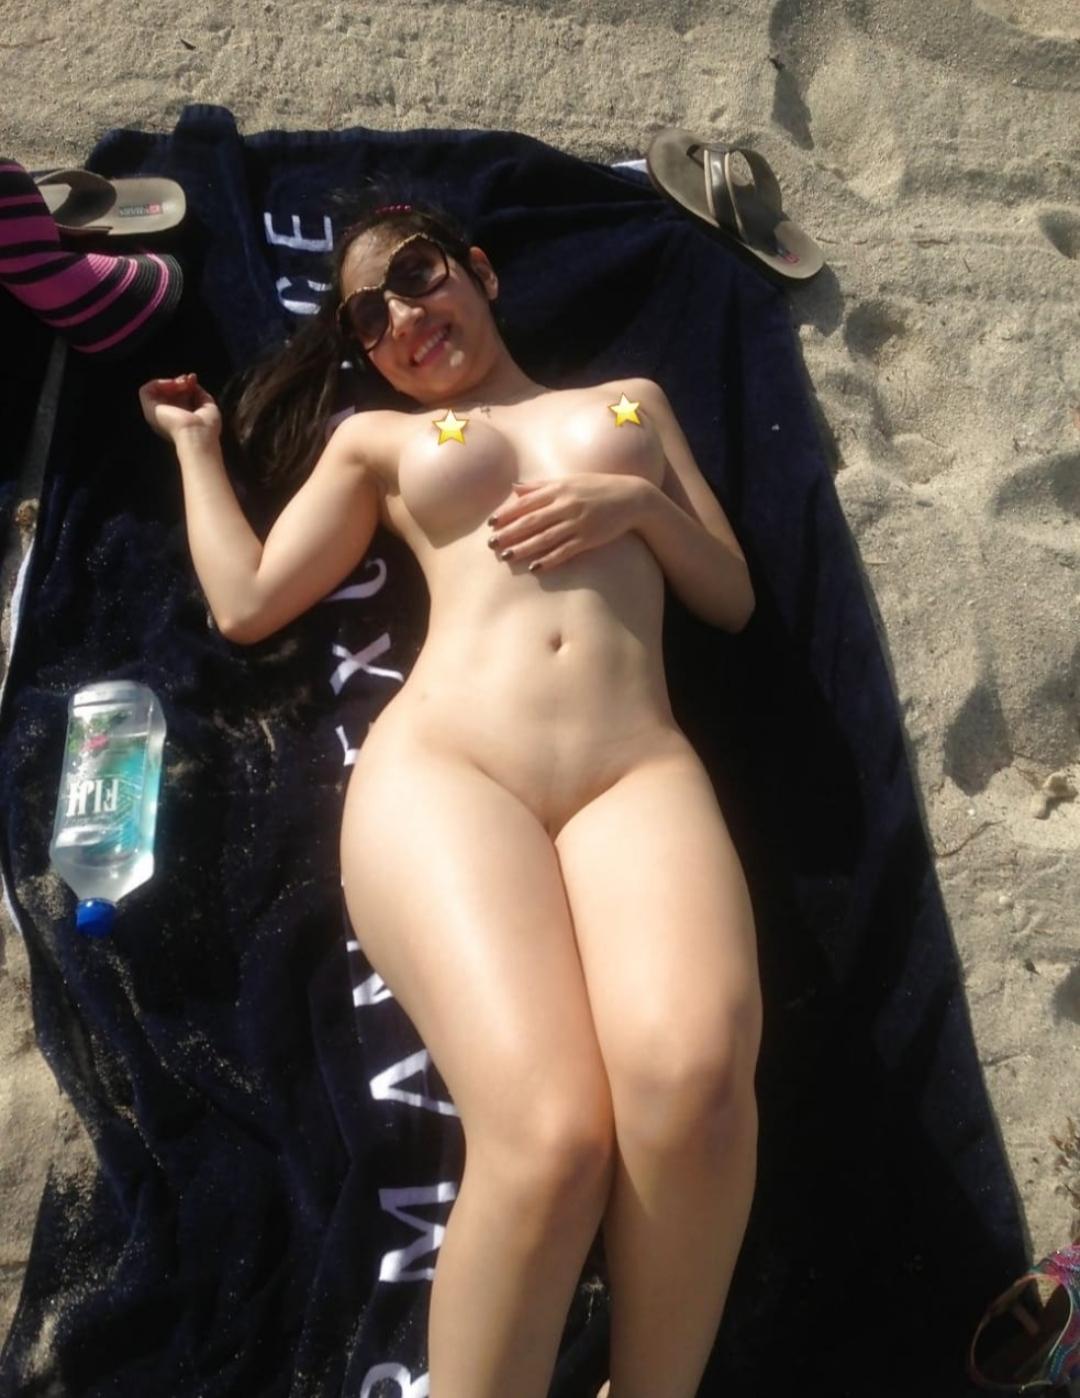 Hermosa blanquita se desnuda en la playa.! Full Nudes 1